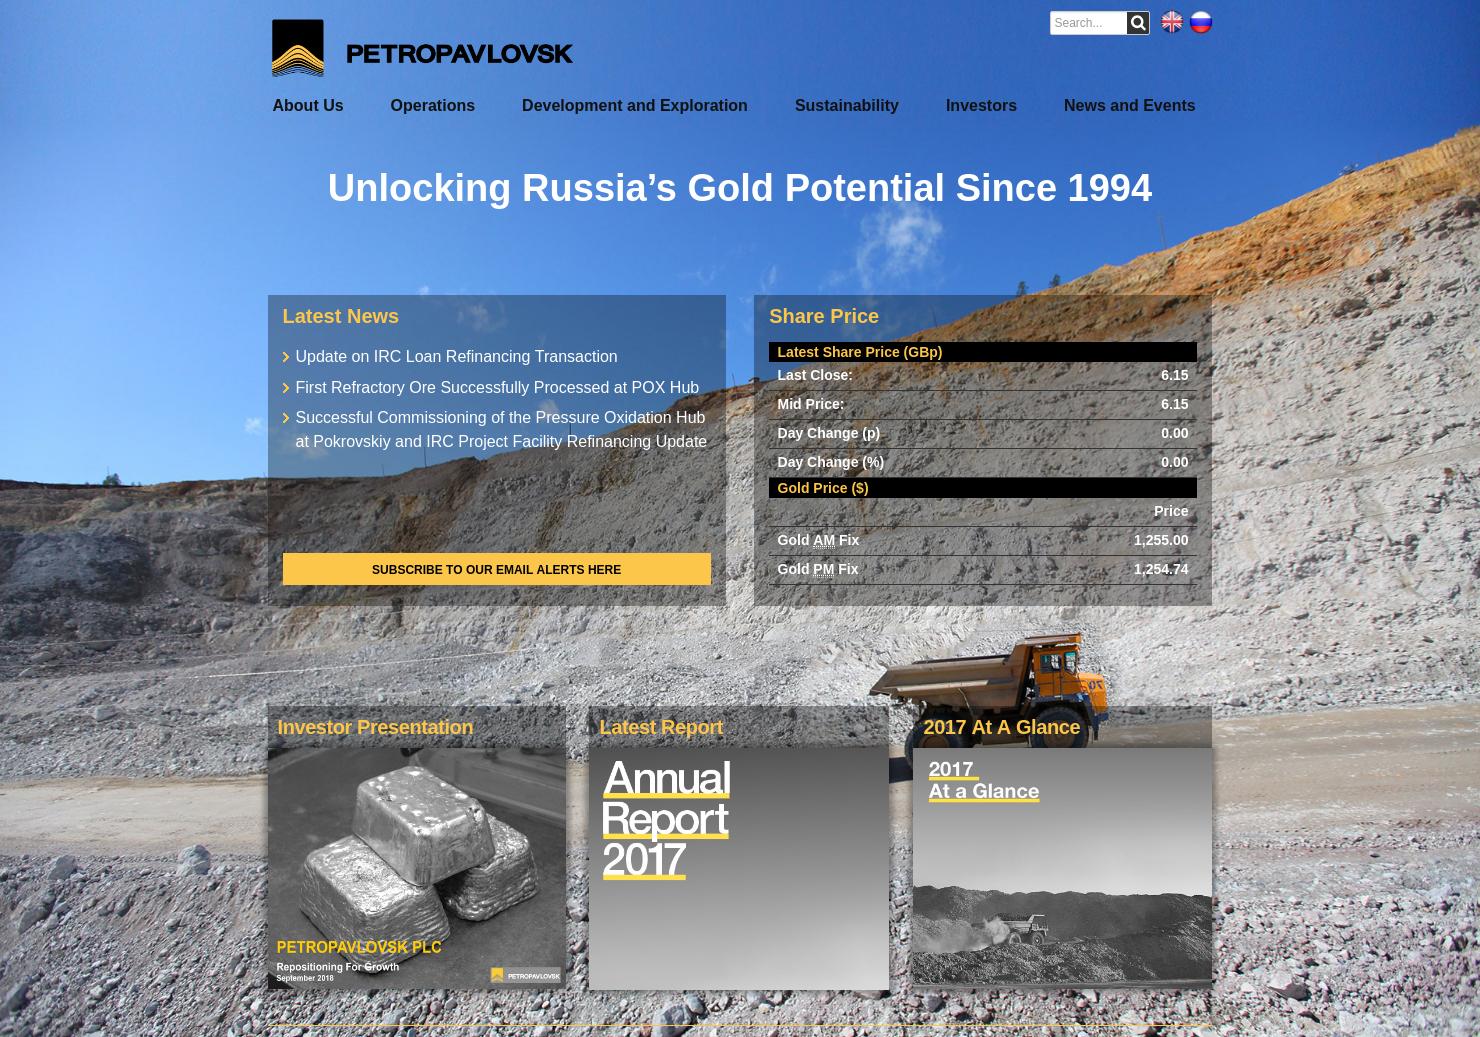 Petropavlovsk Home Page